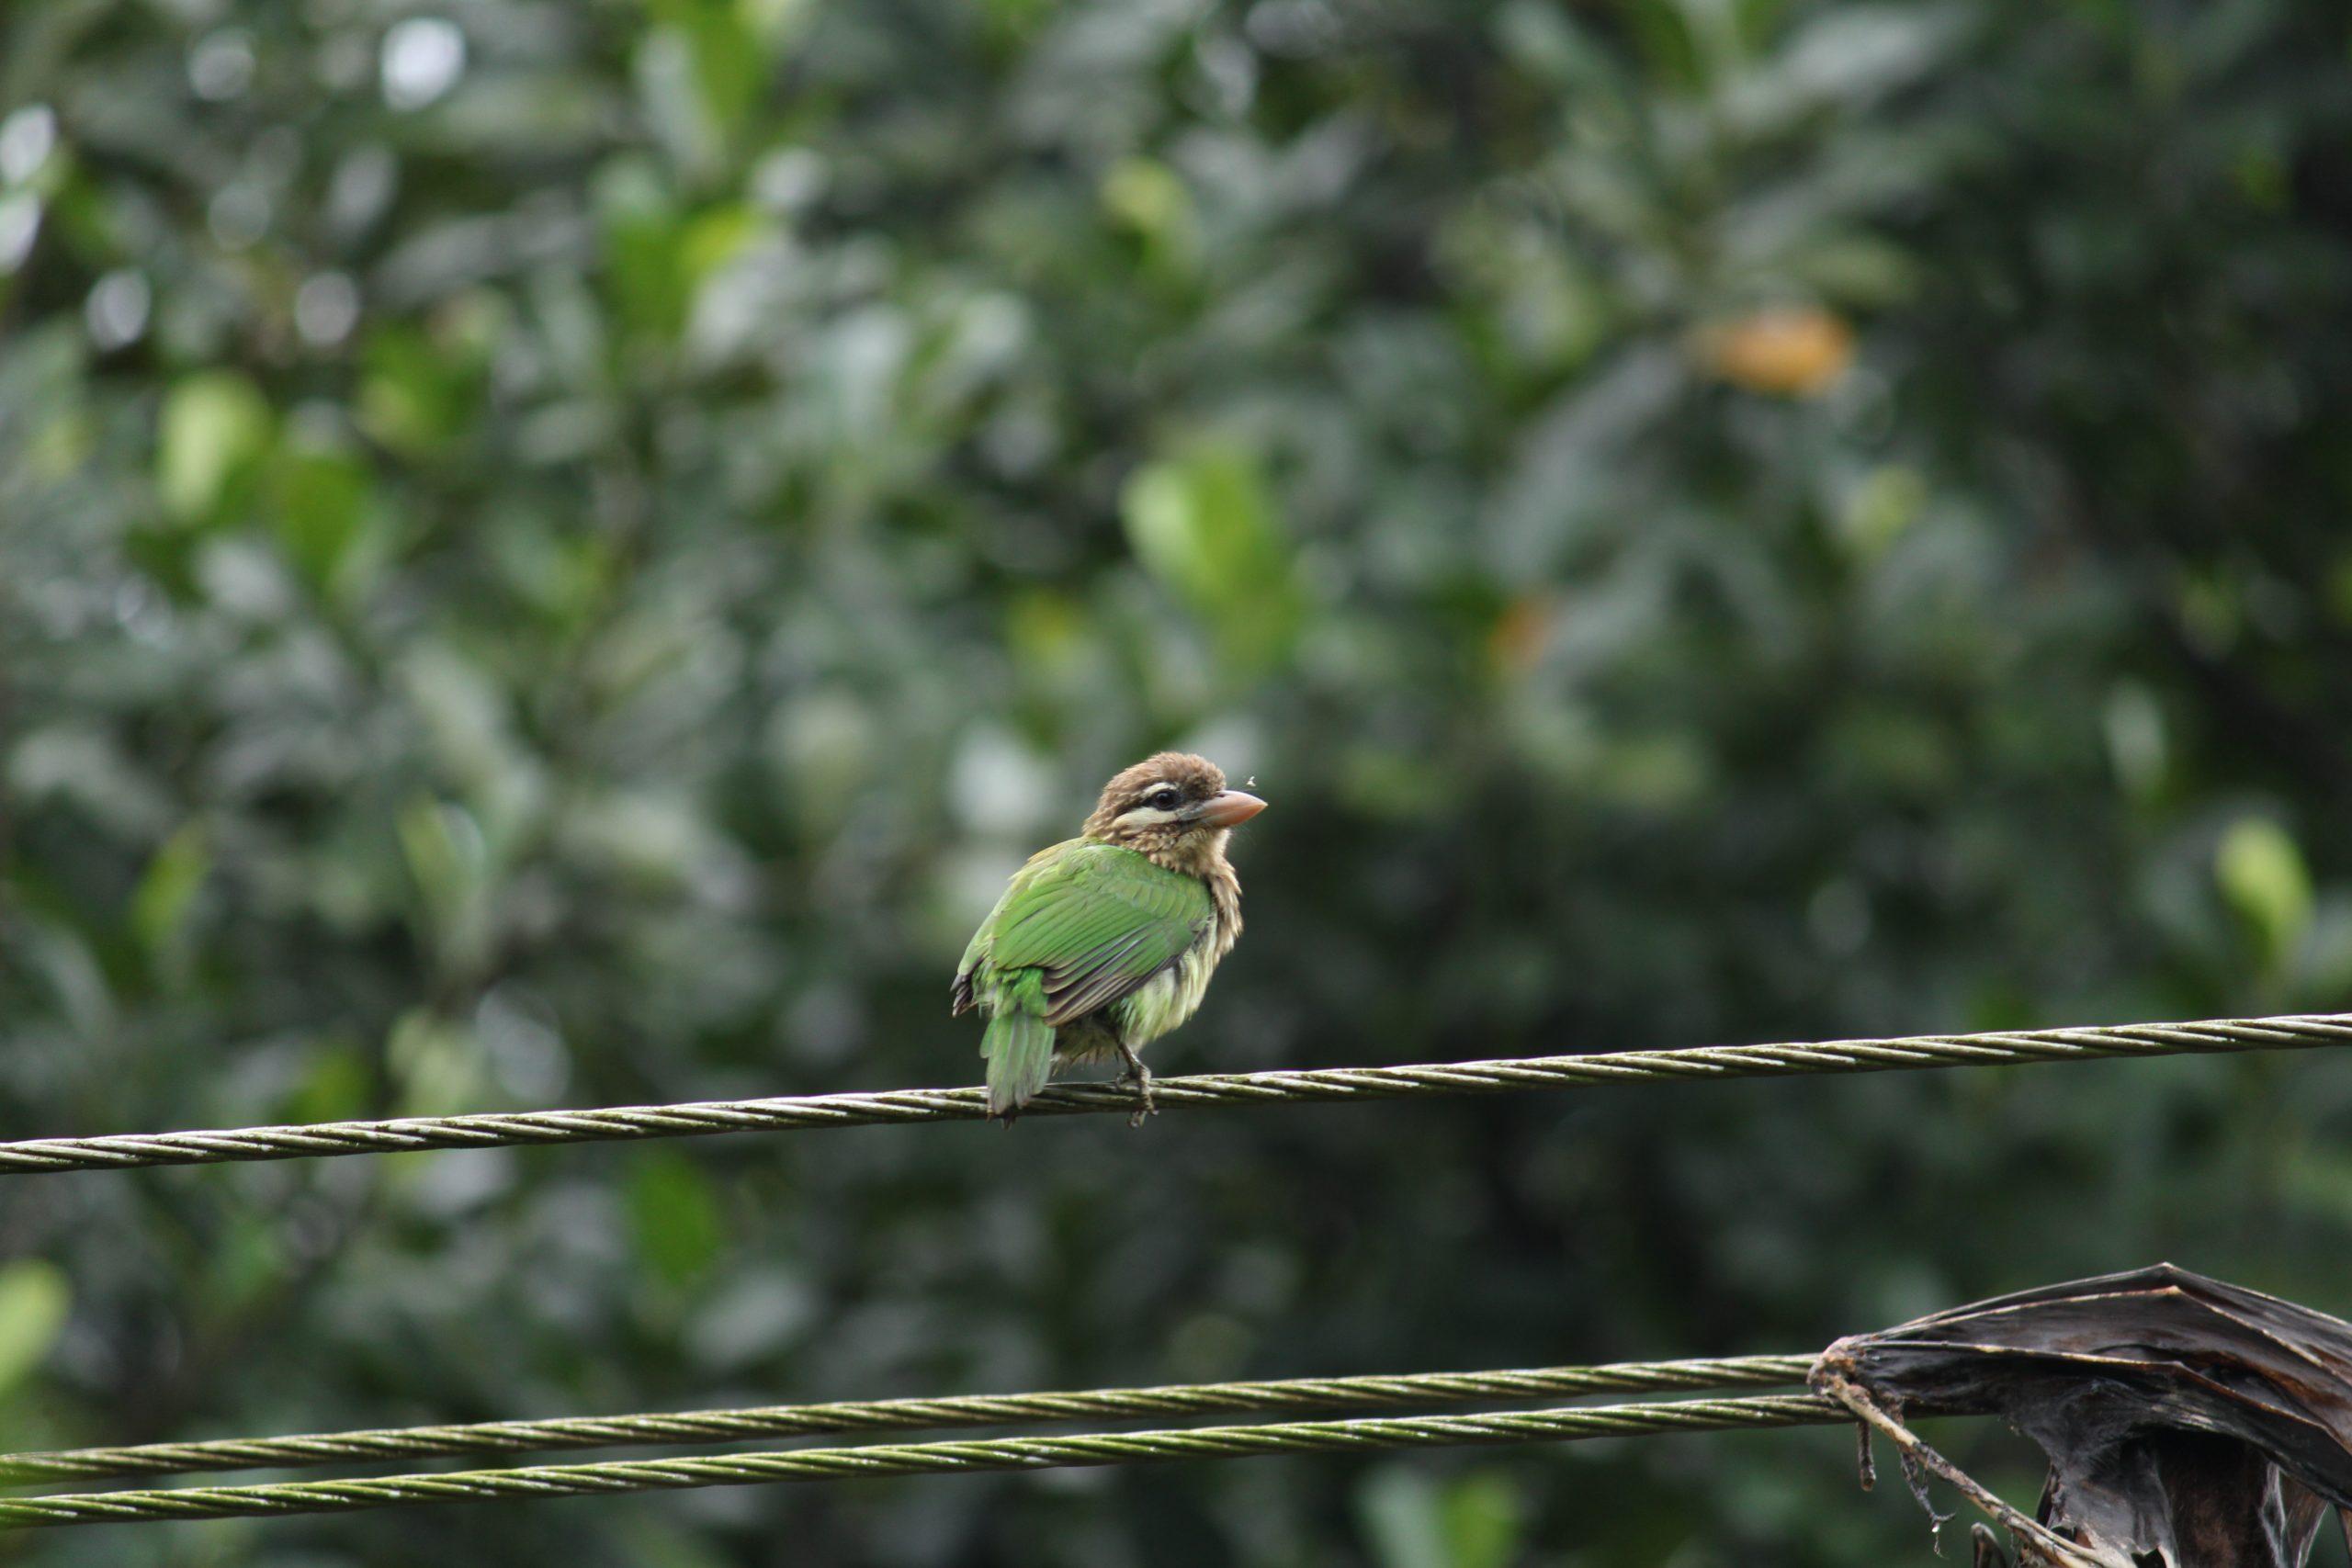 a tiny bird sitting on a wire